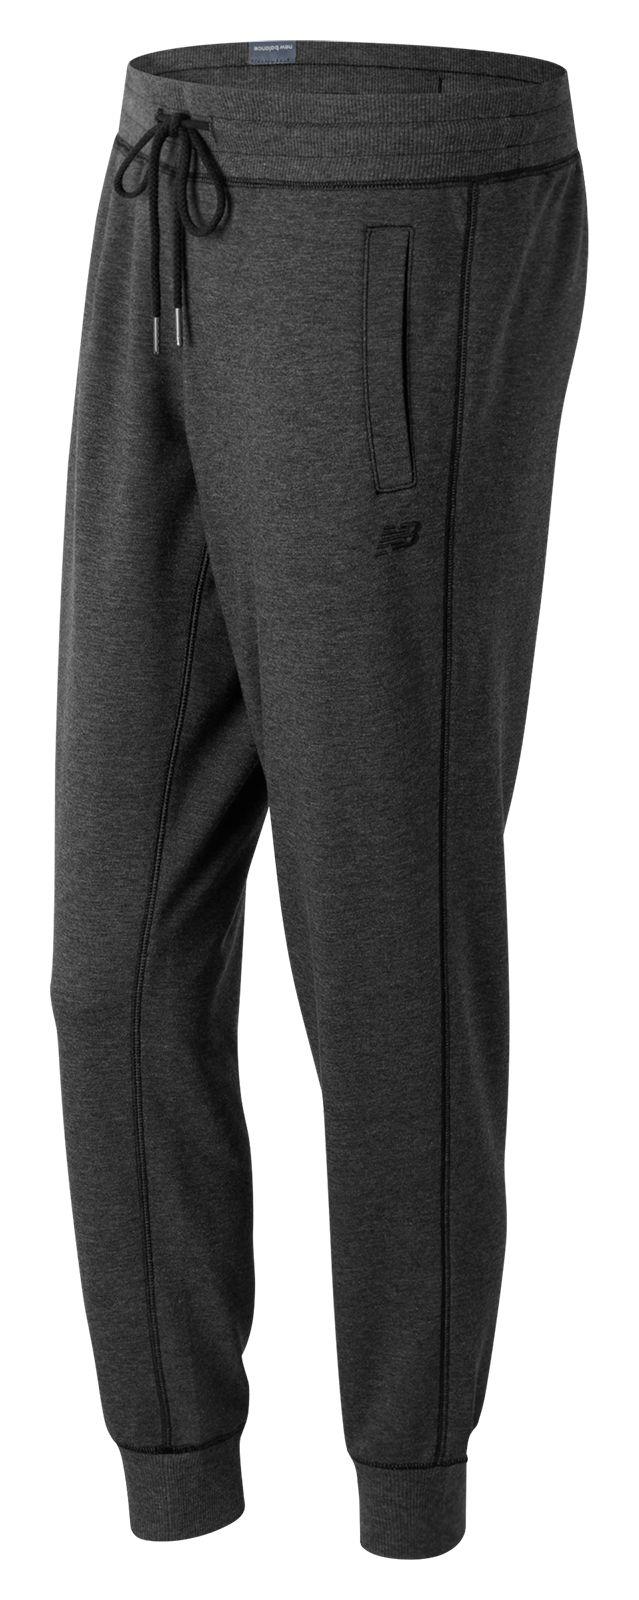 New Balance Classic Tailored Sweatpant Womens Grey